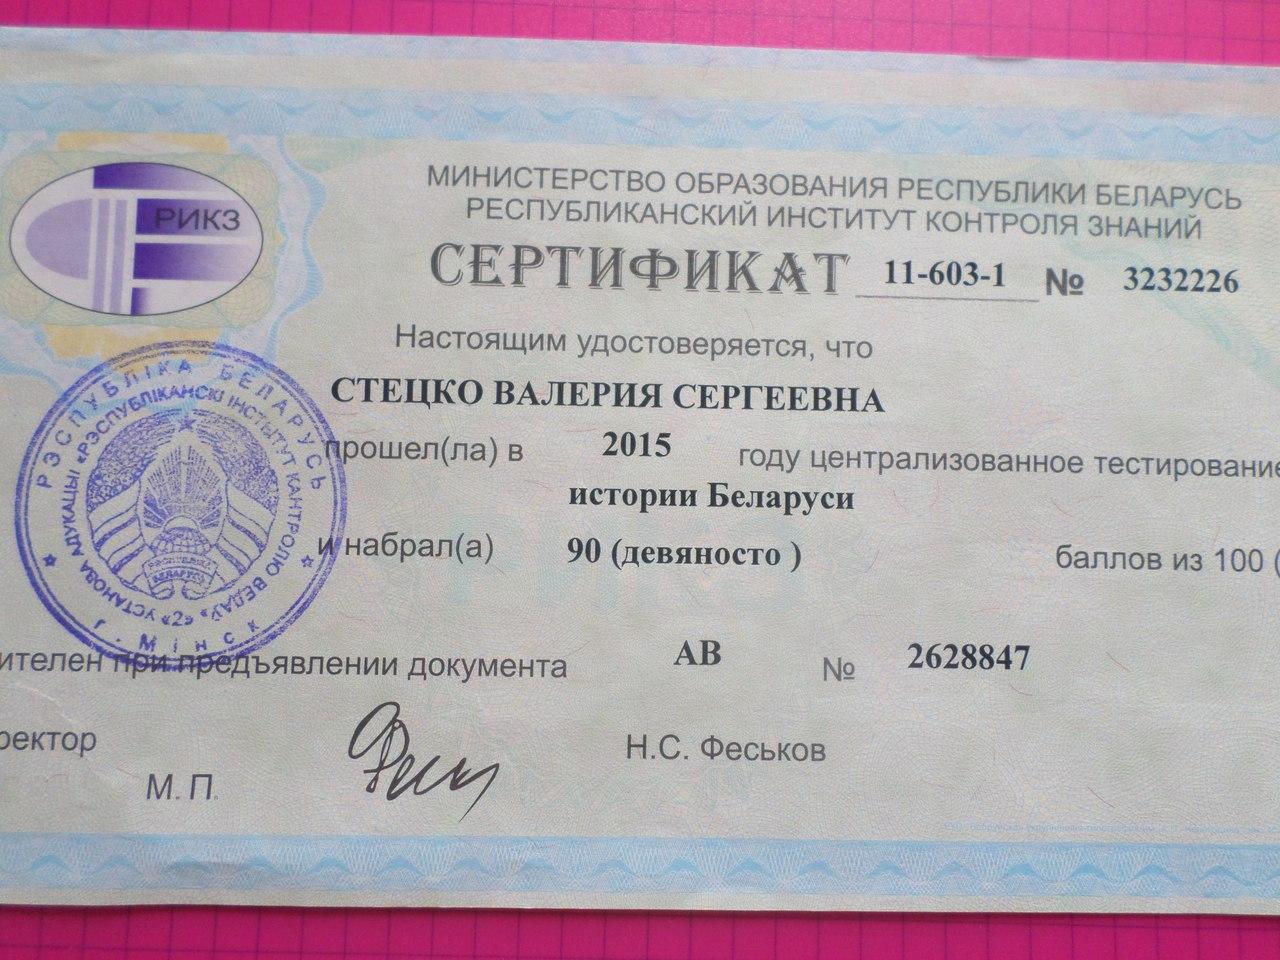 Стецко - сертификат ЦТ